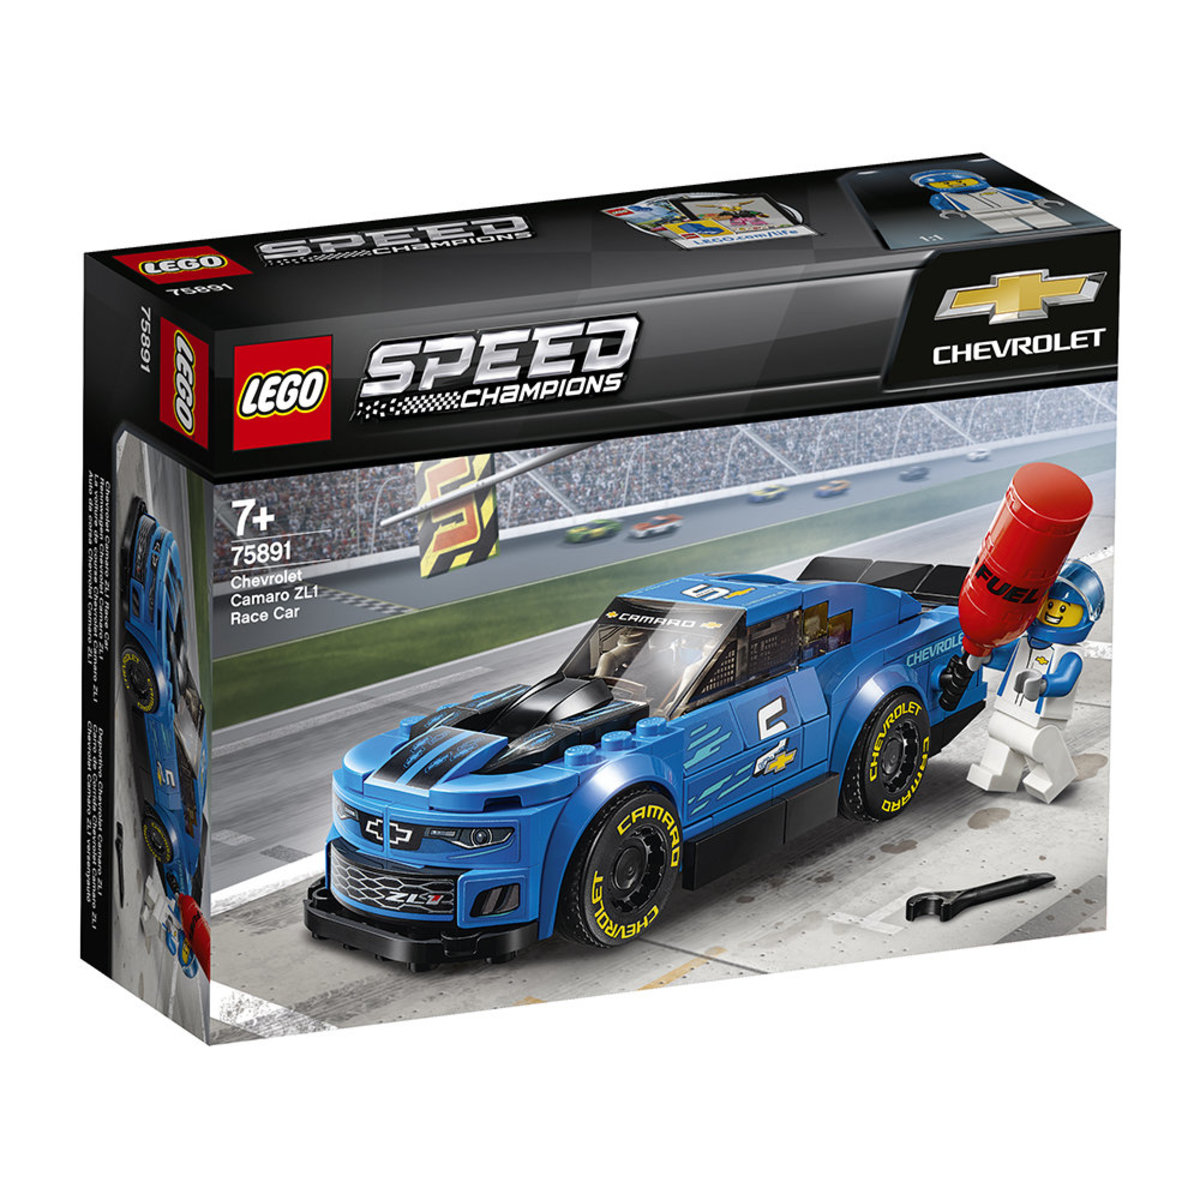 LEGO®Speed Champions 75891 Chevrolet Camaro ZL1 Race Car (Racing, Car)